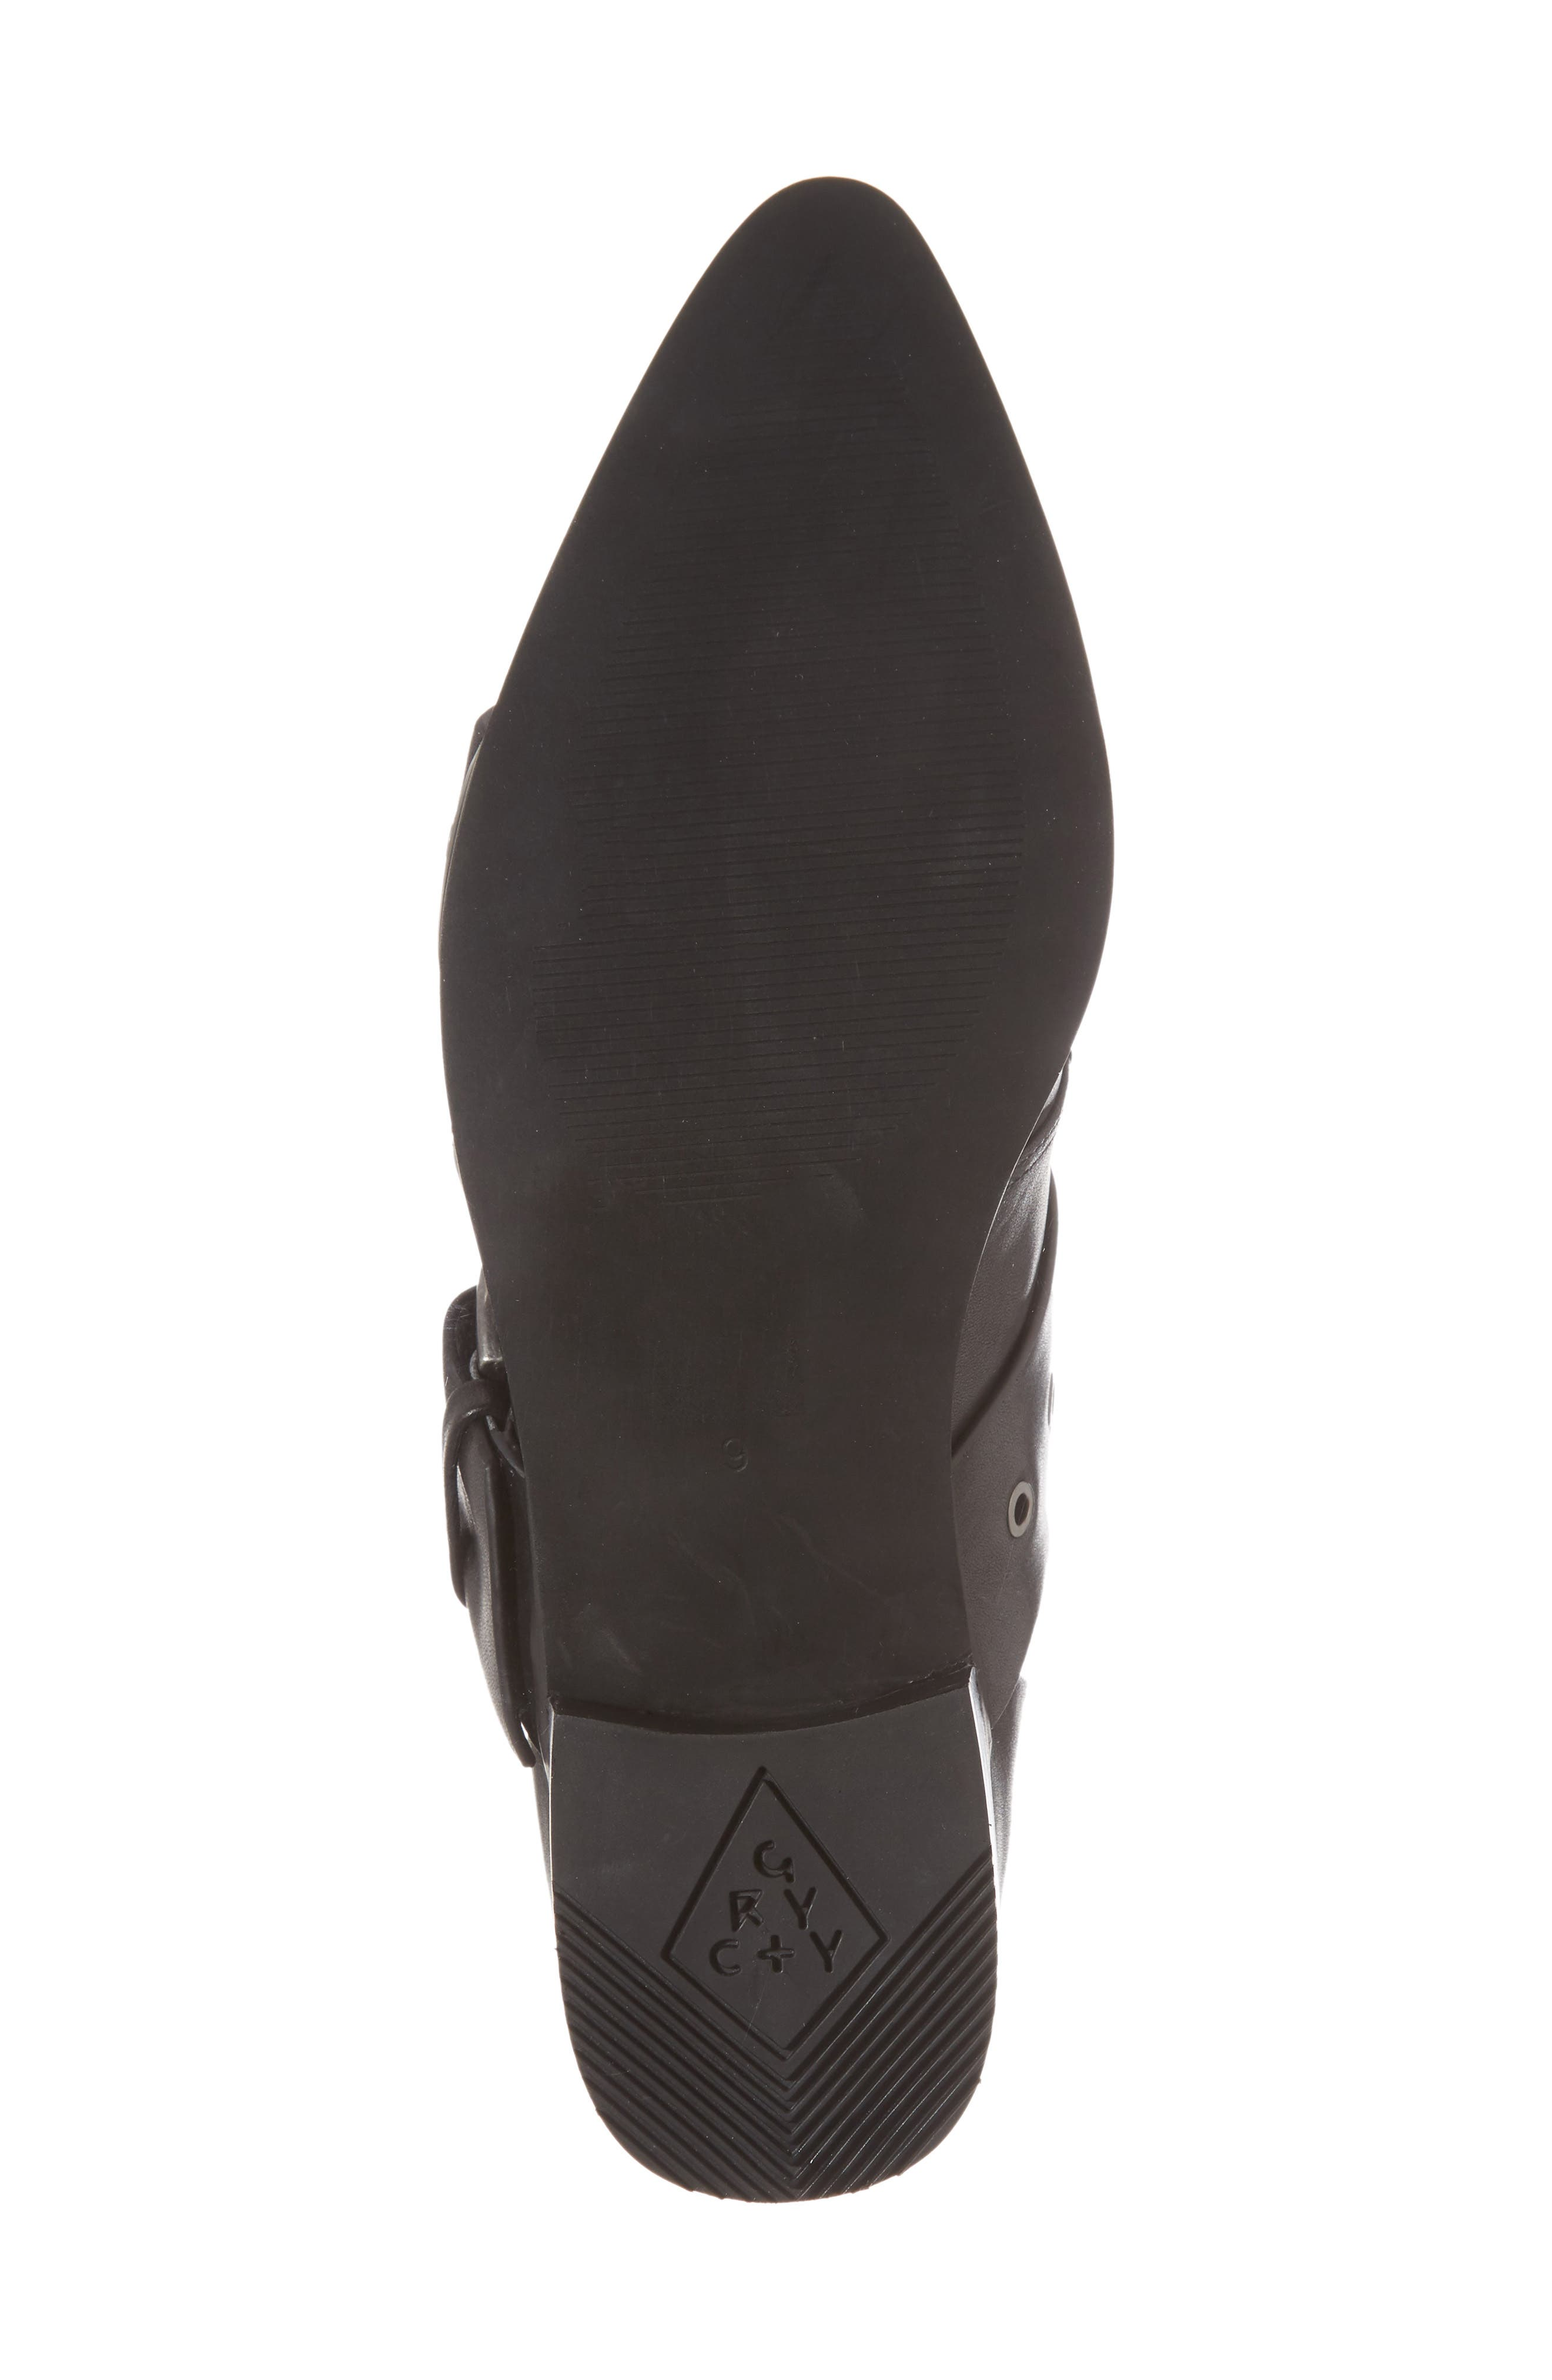 Buckle Strap Bootie,                             Alternate thumbnail 6, color,                             Black Leather